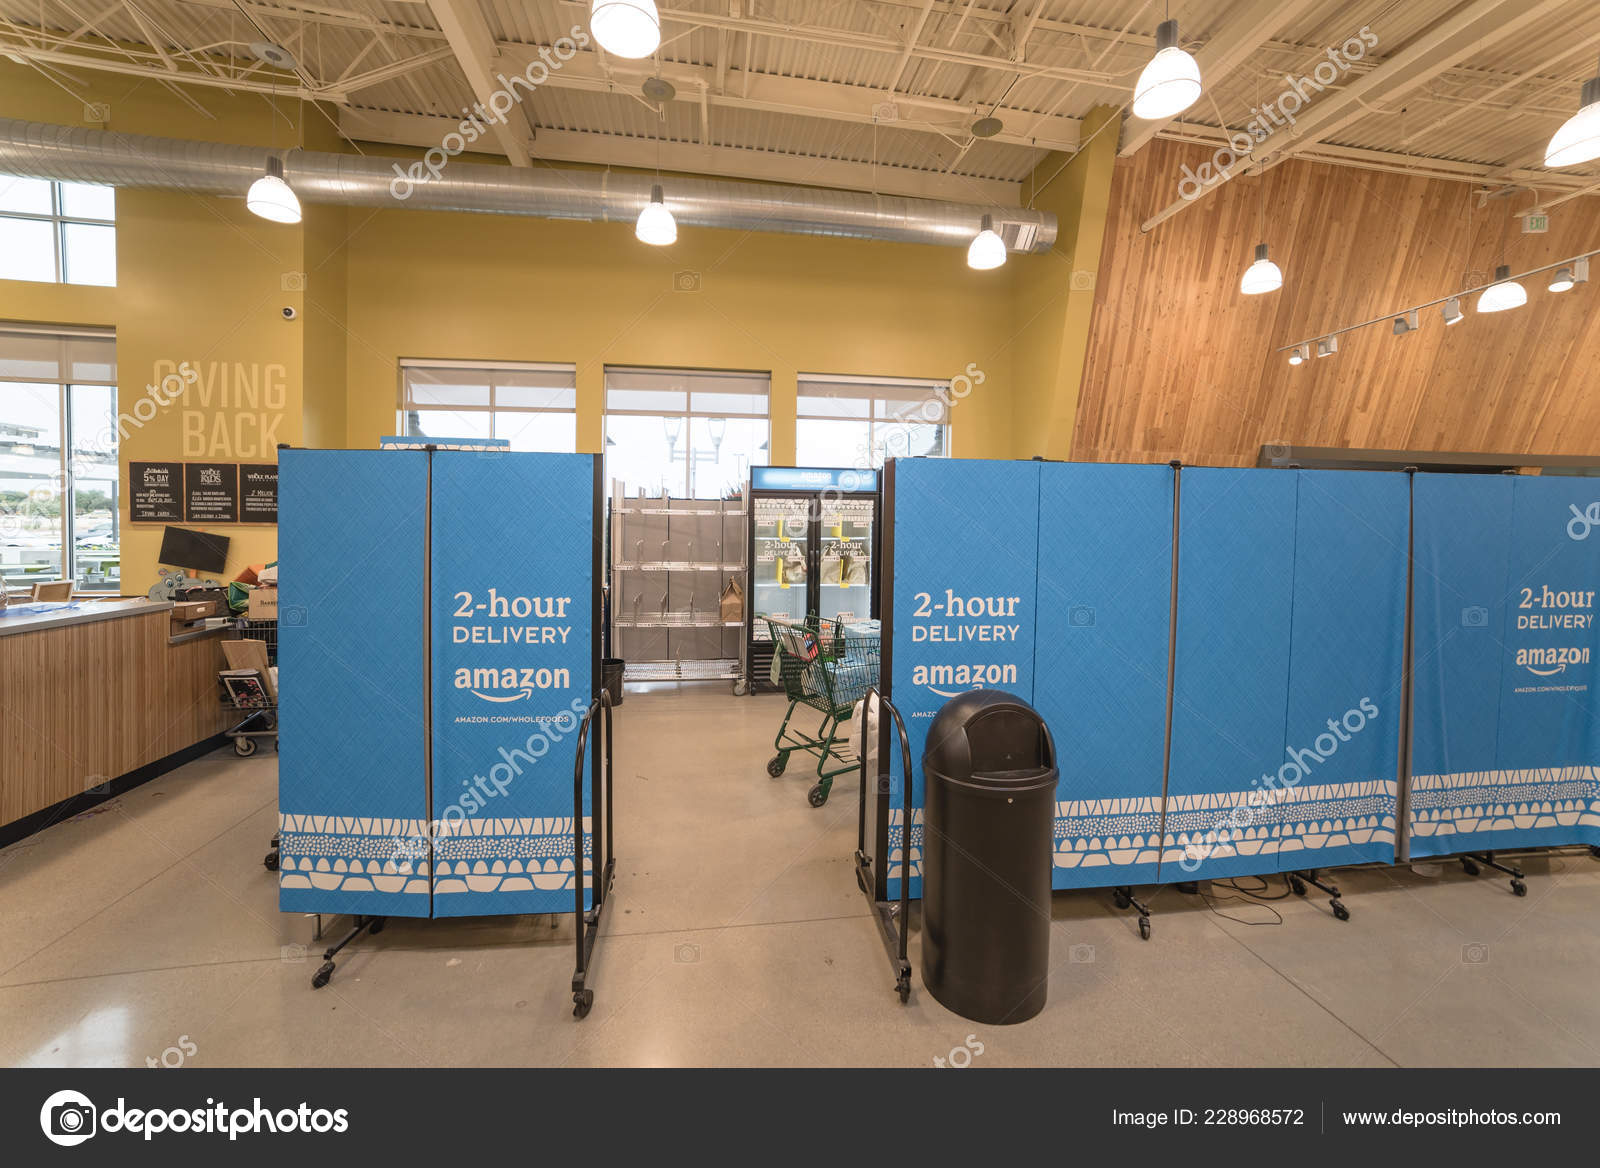 Irving Nov 2018 Hour Delivery Service Amazon Prime Member